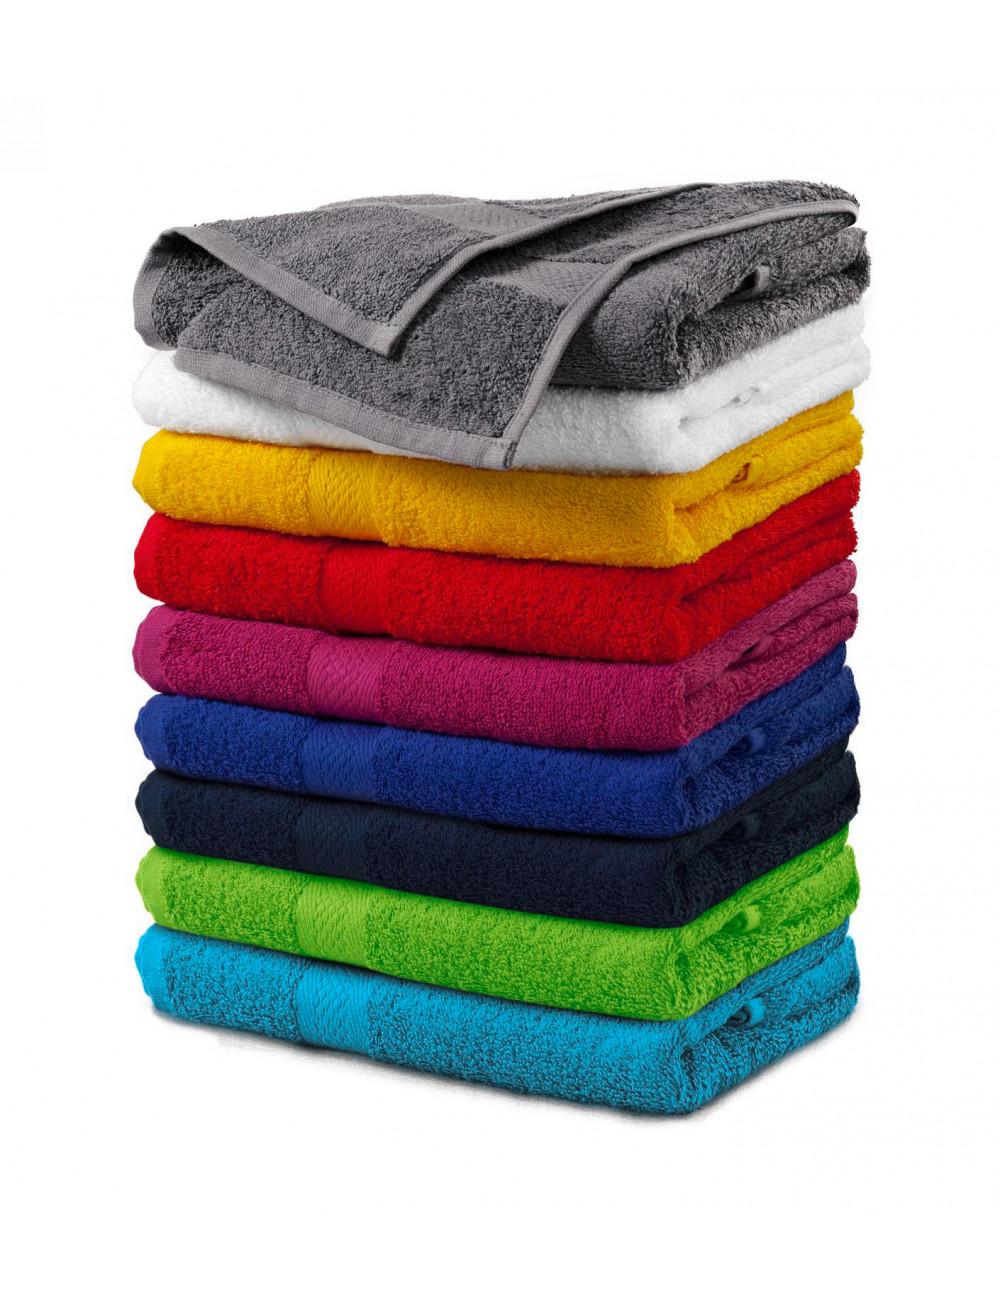 Adler MALFINI Ręcznik unisex Terry Towel 903 fuchsia red